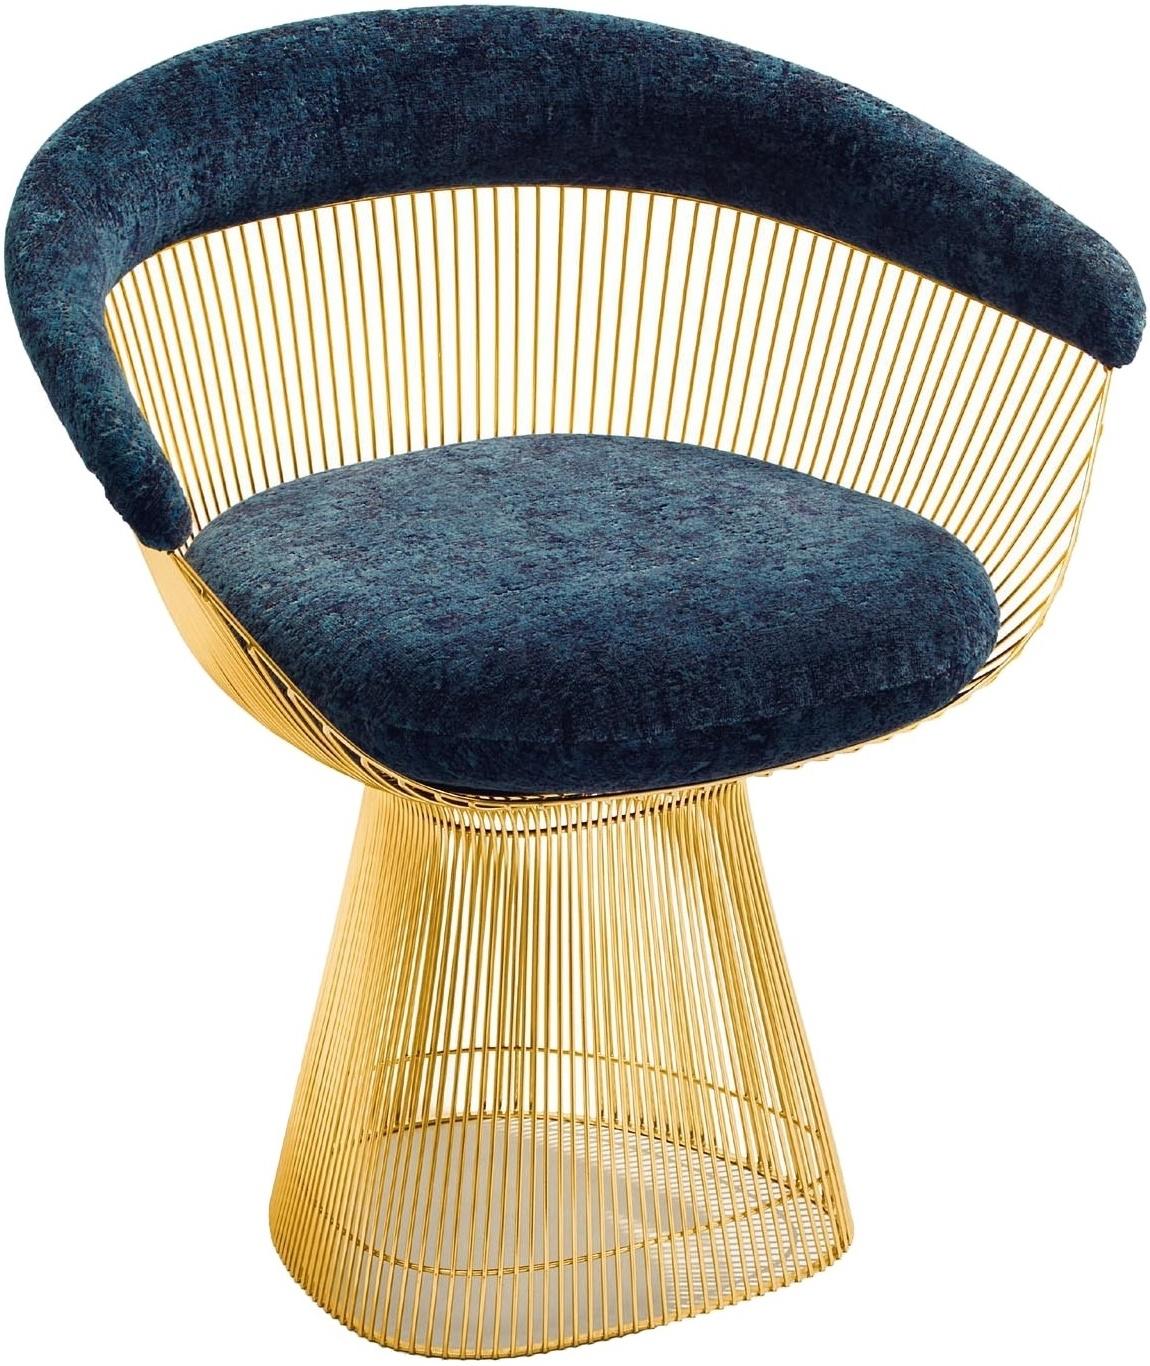 black zoom knoll mesh chair the ergonomic p blue chairs loading shop life